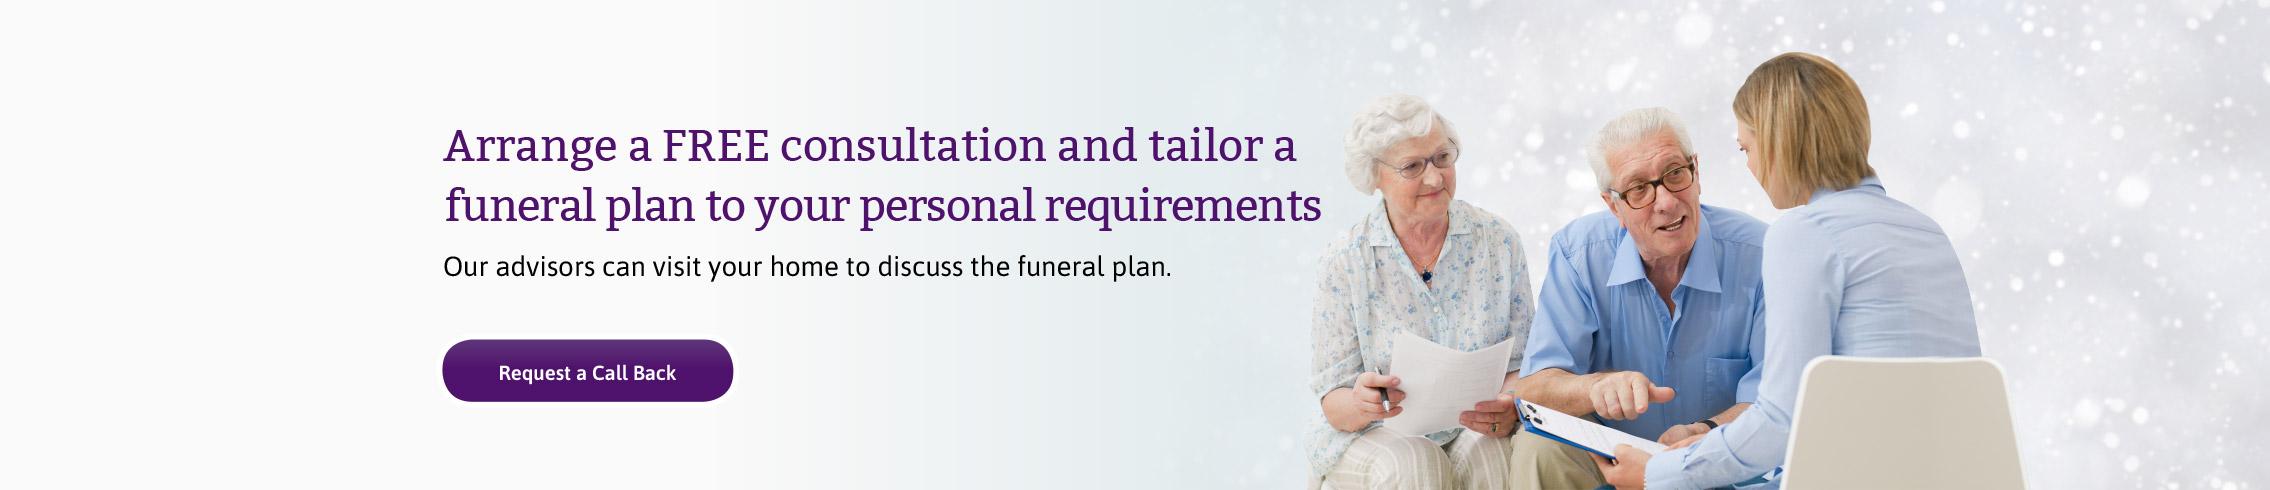 funeral directors stockport funeral plans fixed costs golden charter trust fund funeral arrangements cheshire manchester flexible